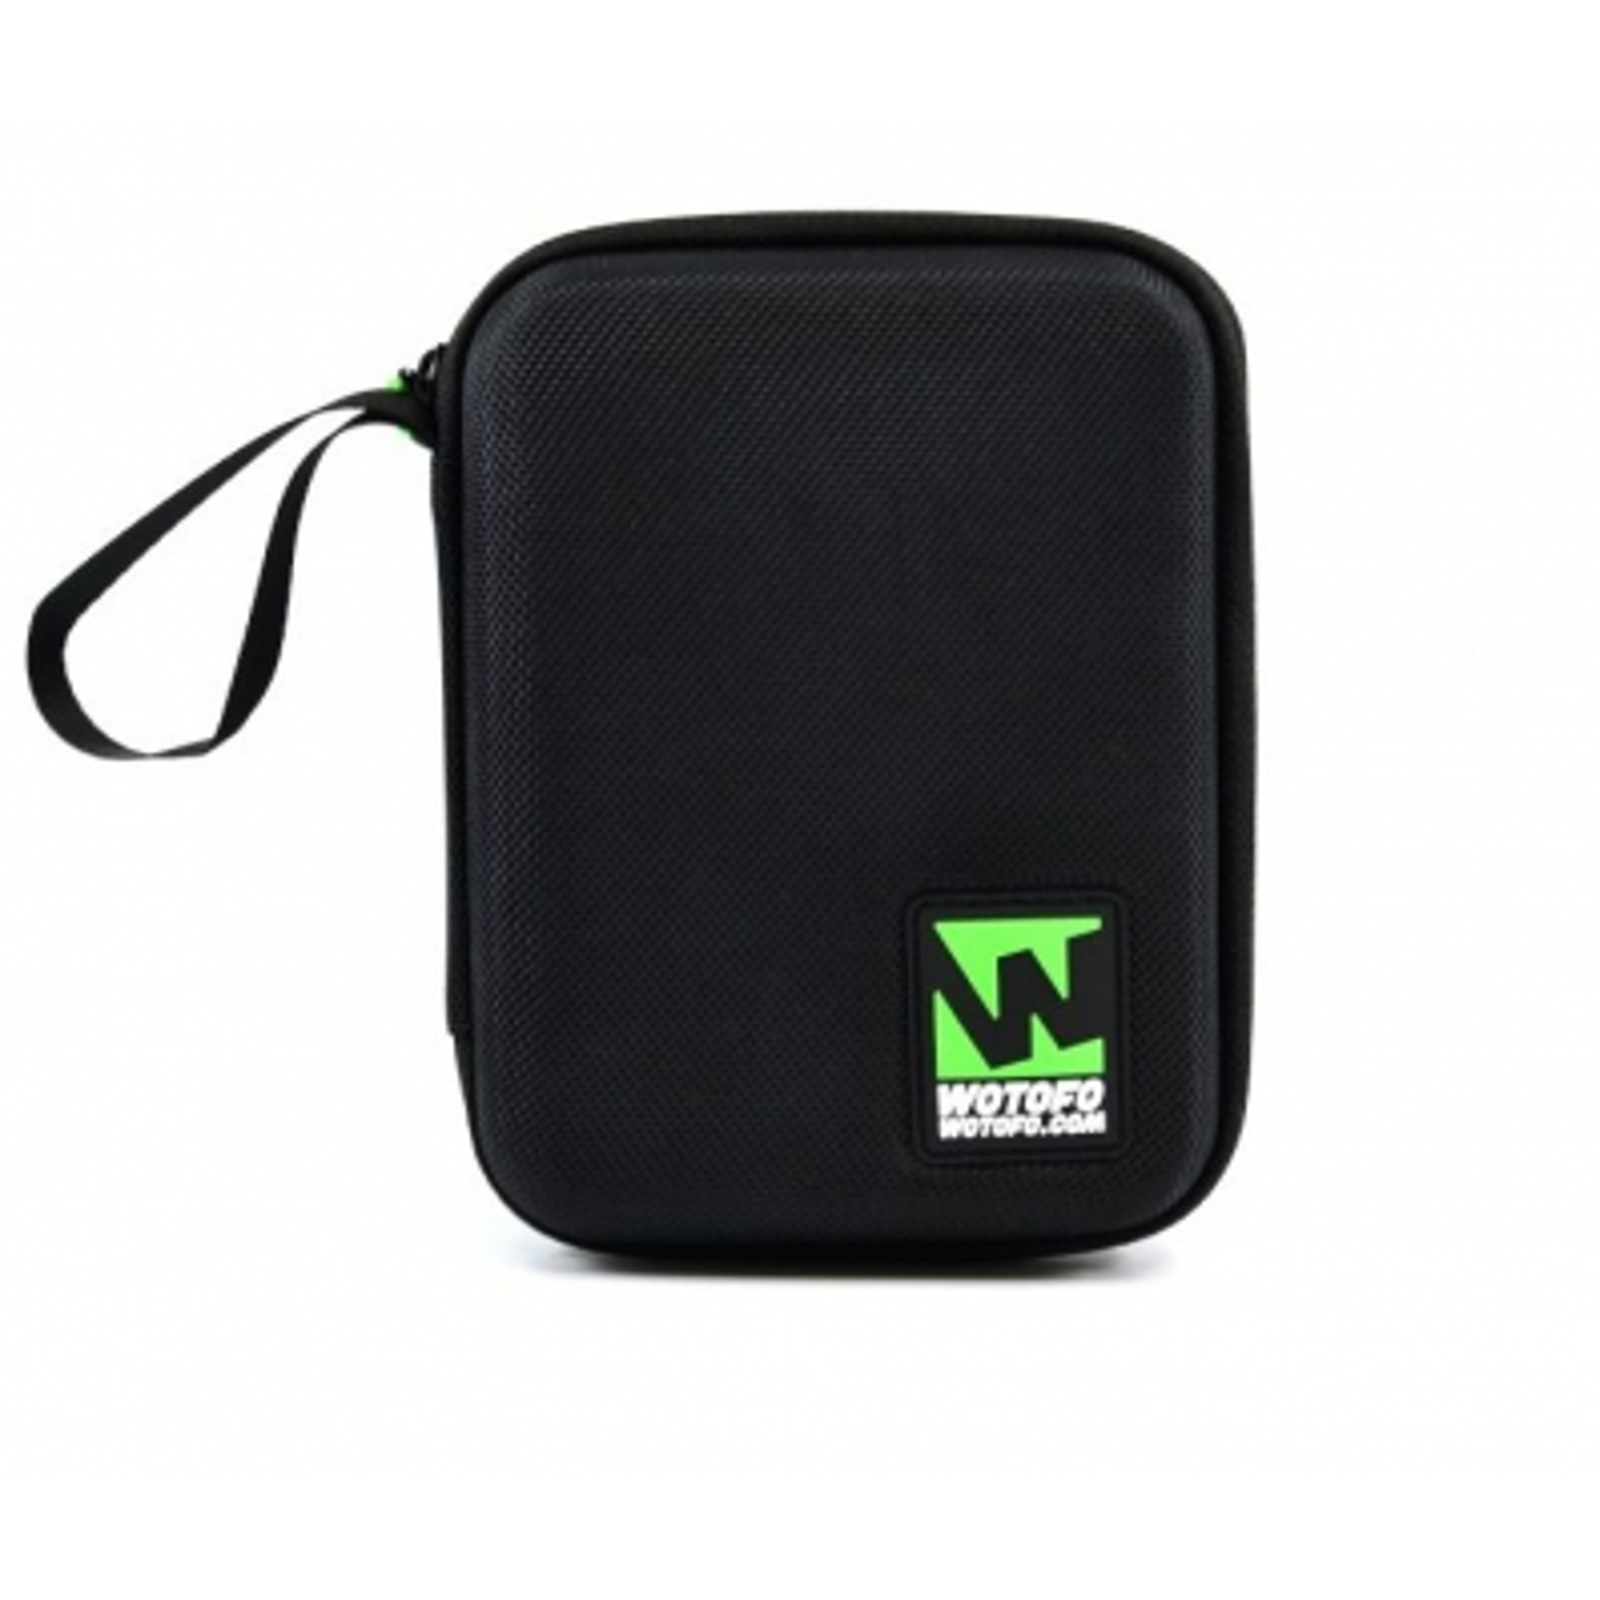 Vape Carry Case - Wotofo